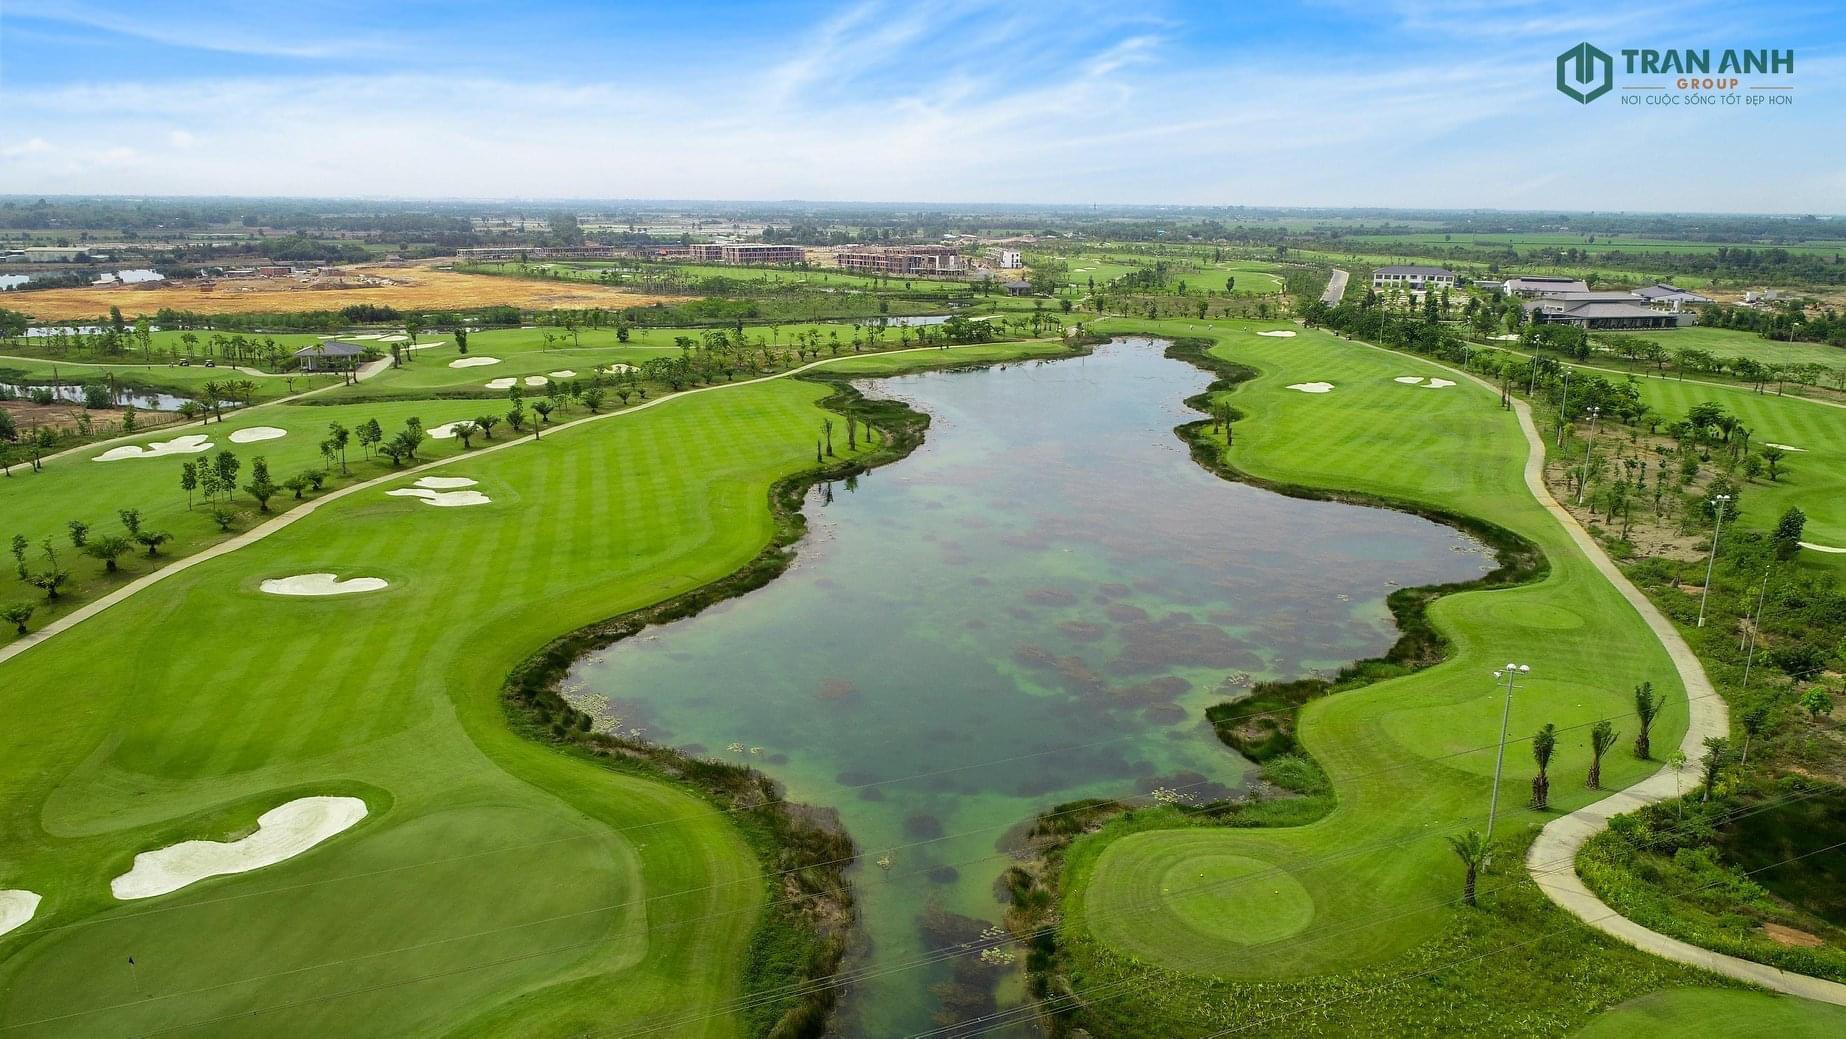 West Lakes sân đánh golf & Villas